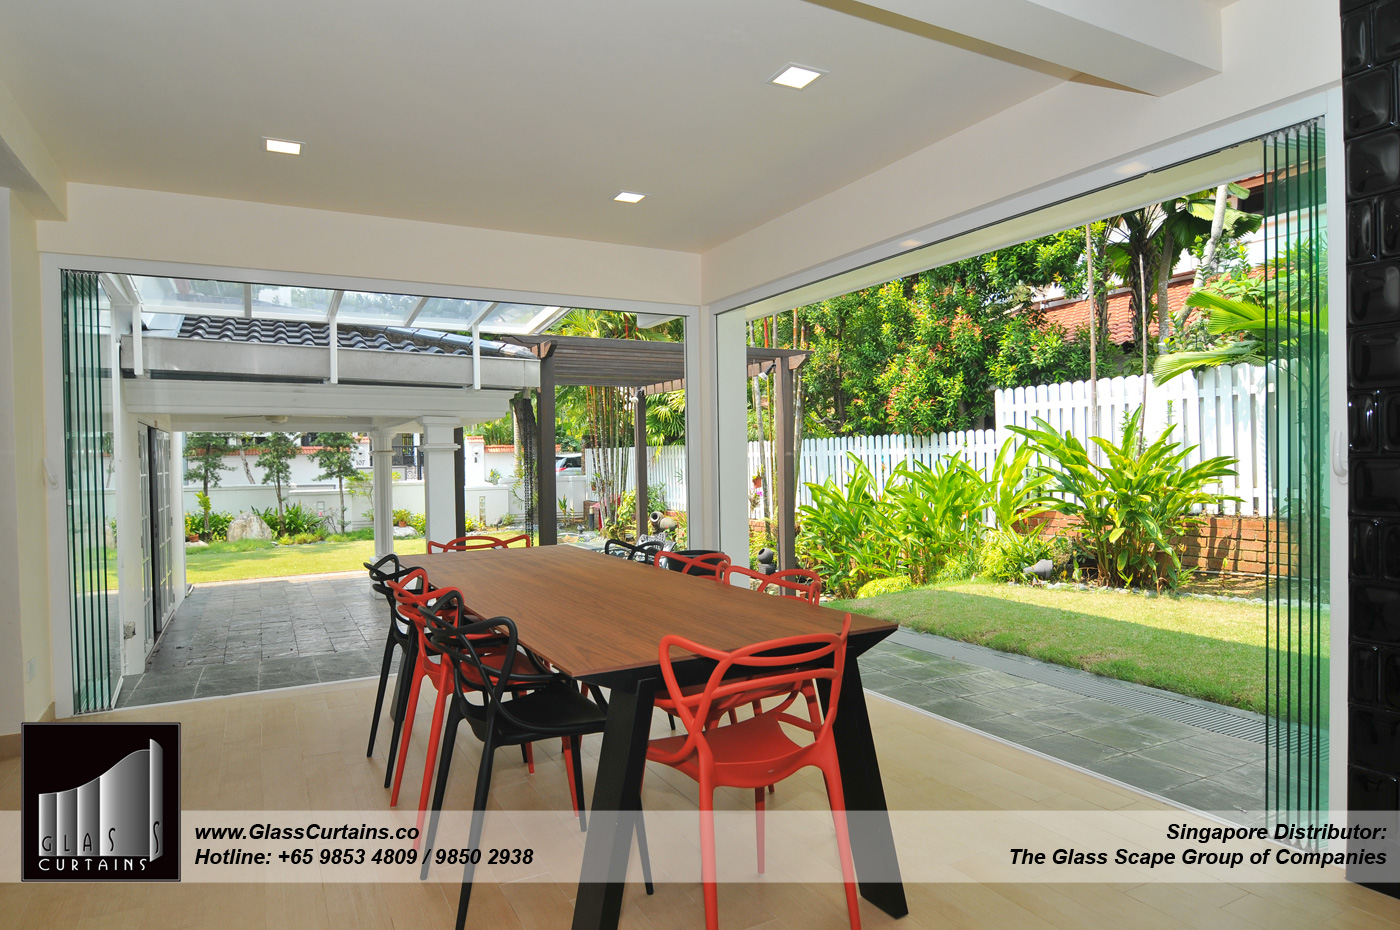 141105-patio-in-opened.jpg